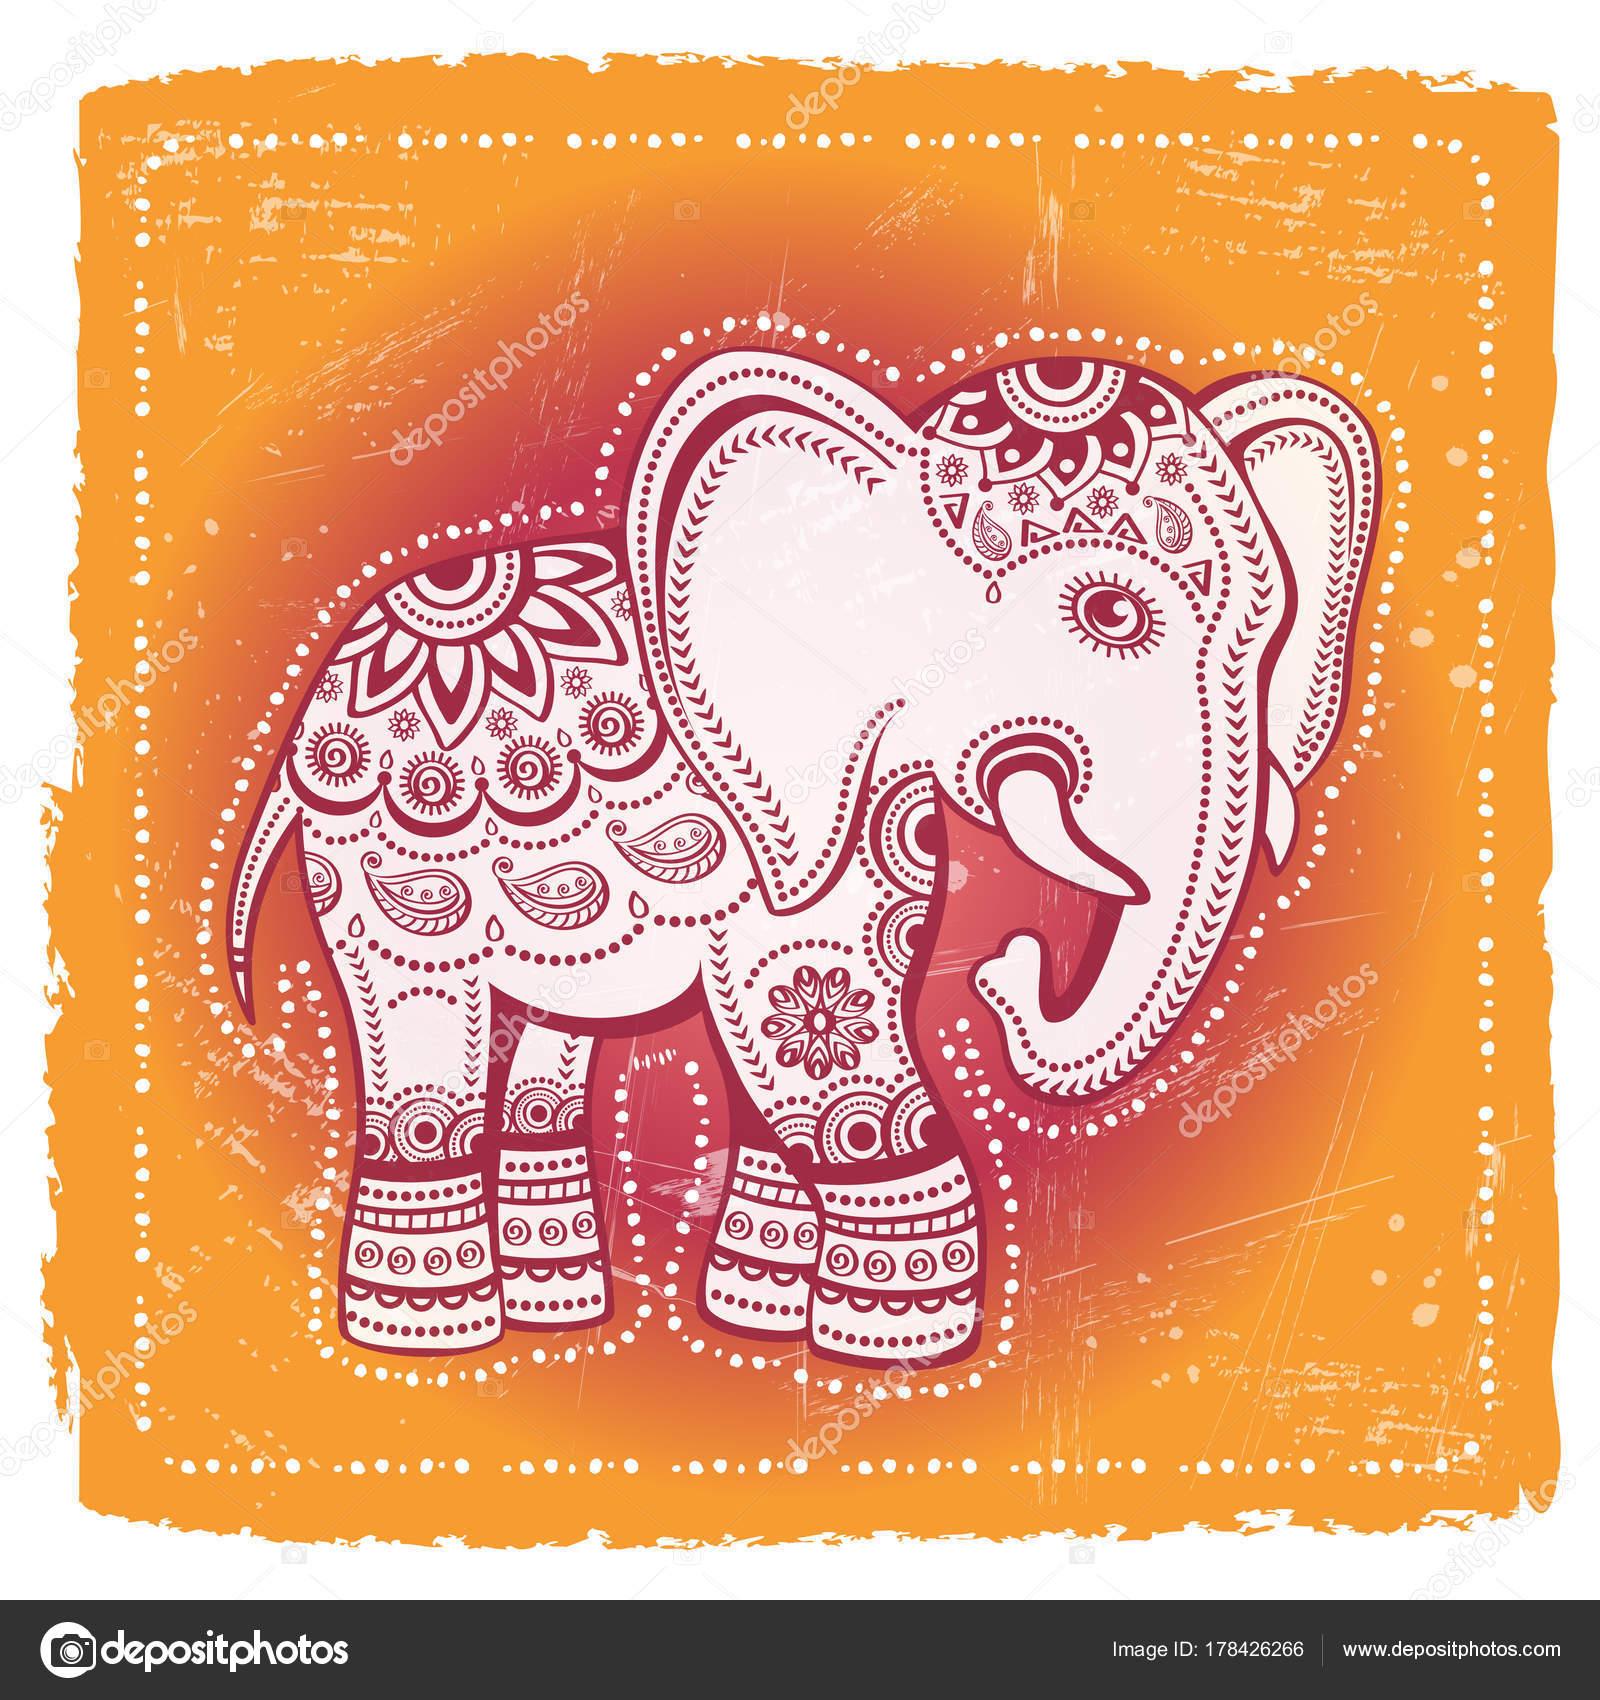 Ethnic elephant tribal background indian god ganesha indian symbol ethnic elephant tribal background indian god ganesha indian symbol prints stock vector buycottarizona Images